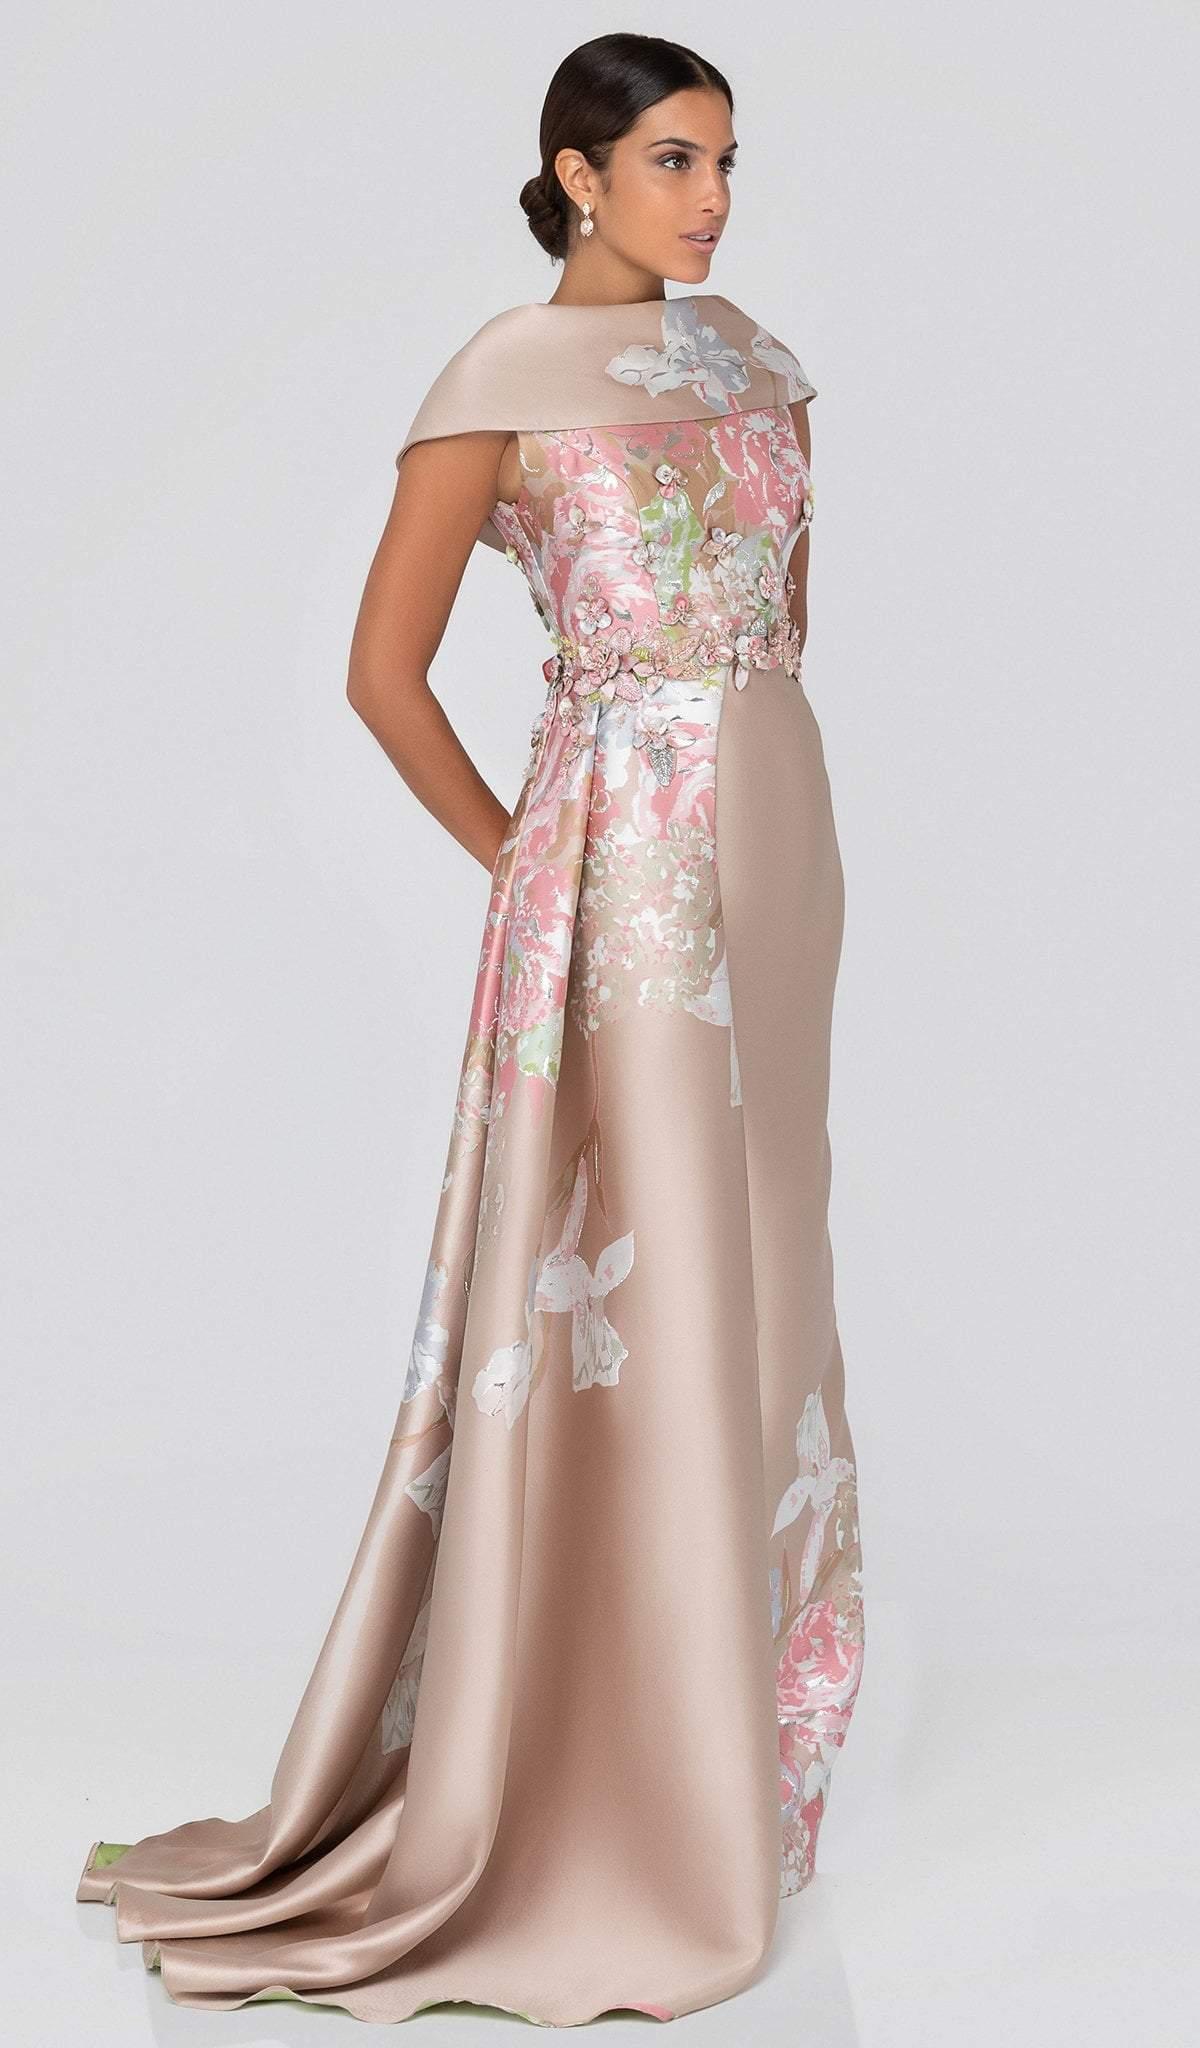 Terani Couture - 1911M9315 Floral Appliqued Cowl Evening Gown